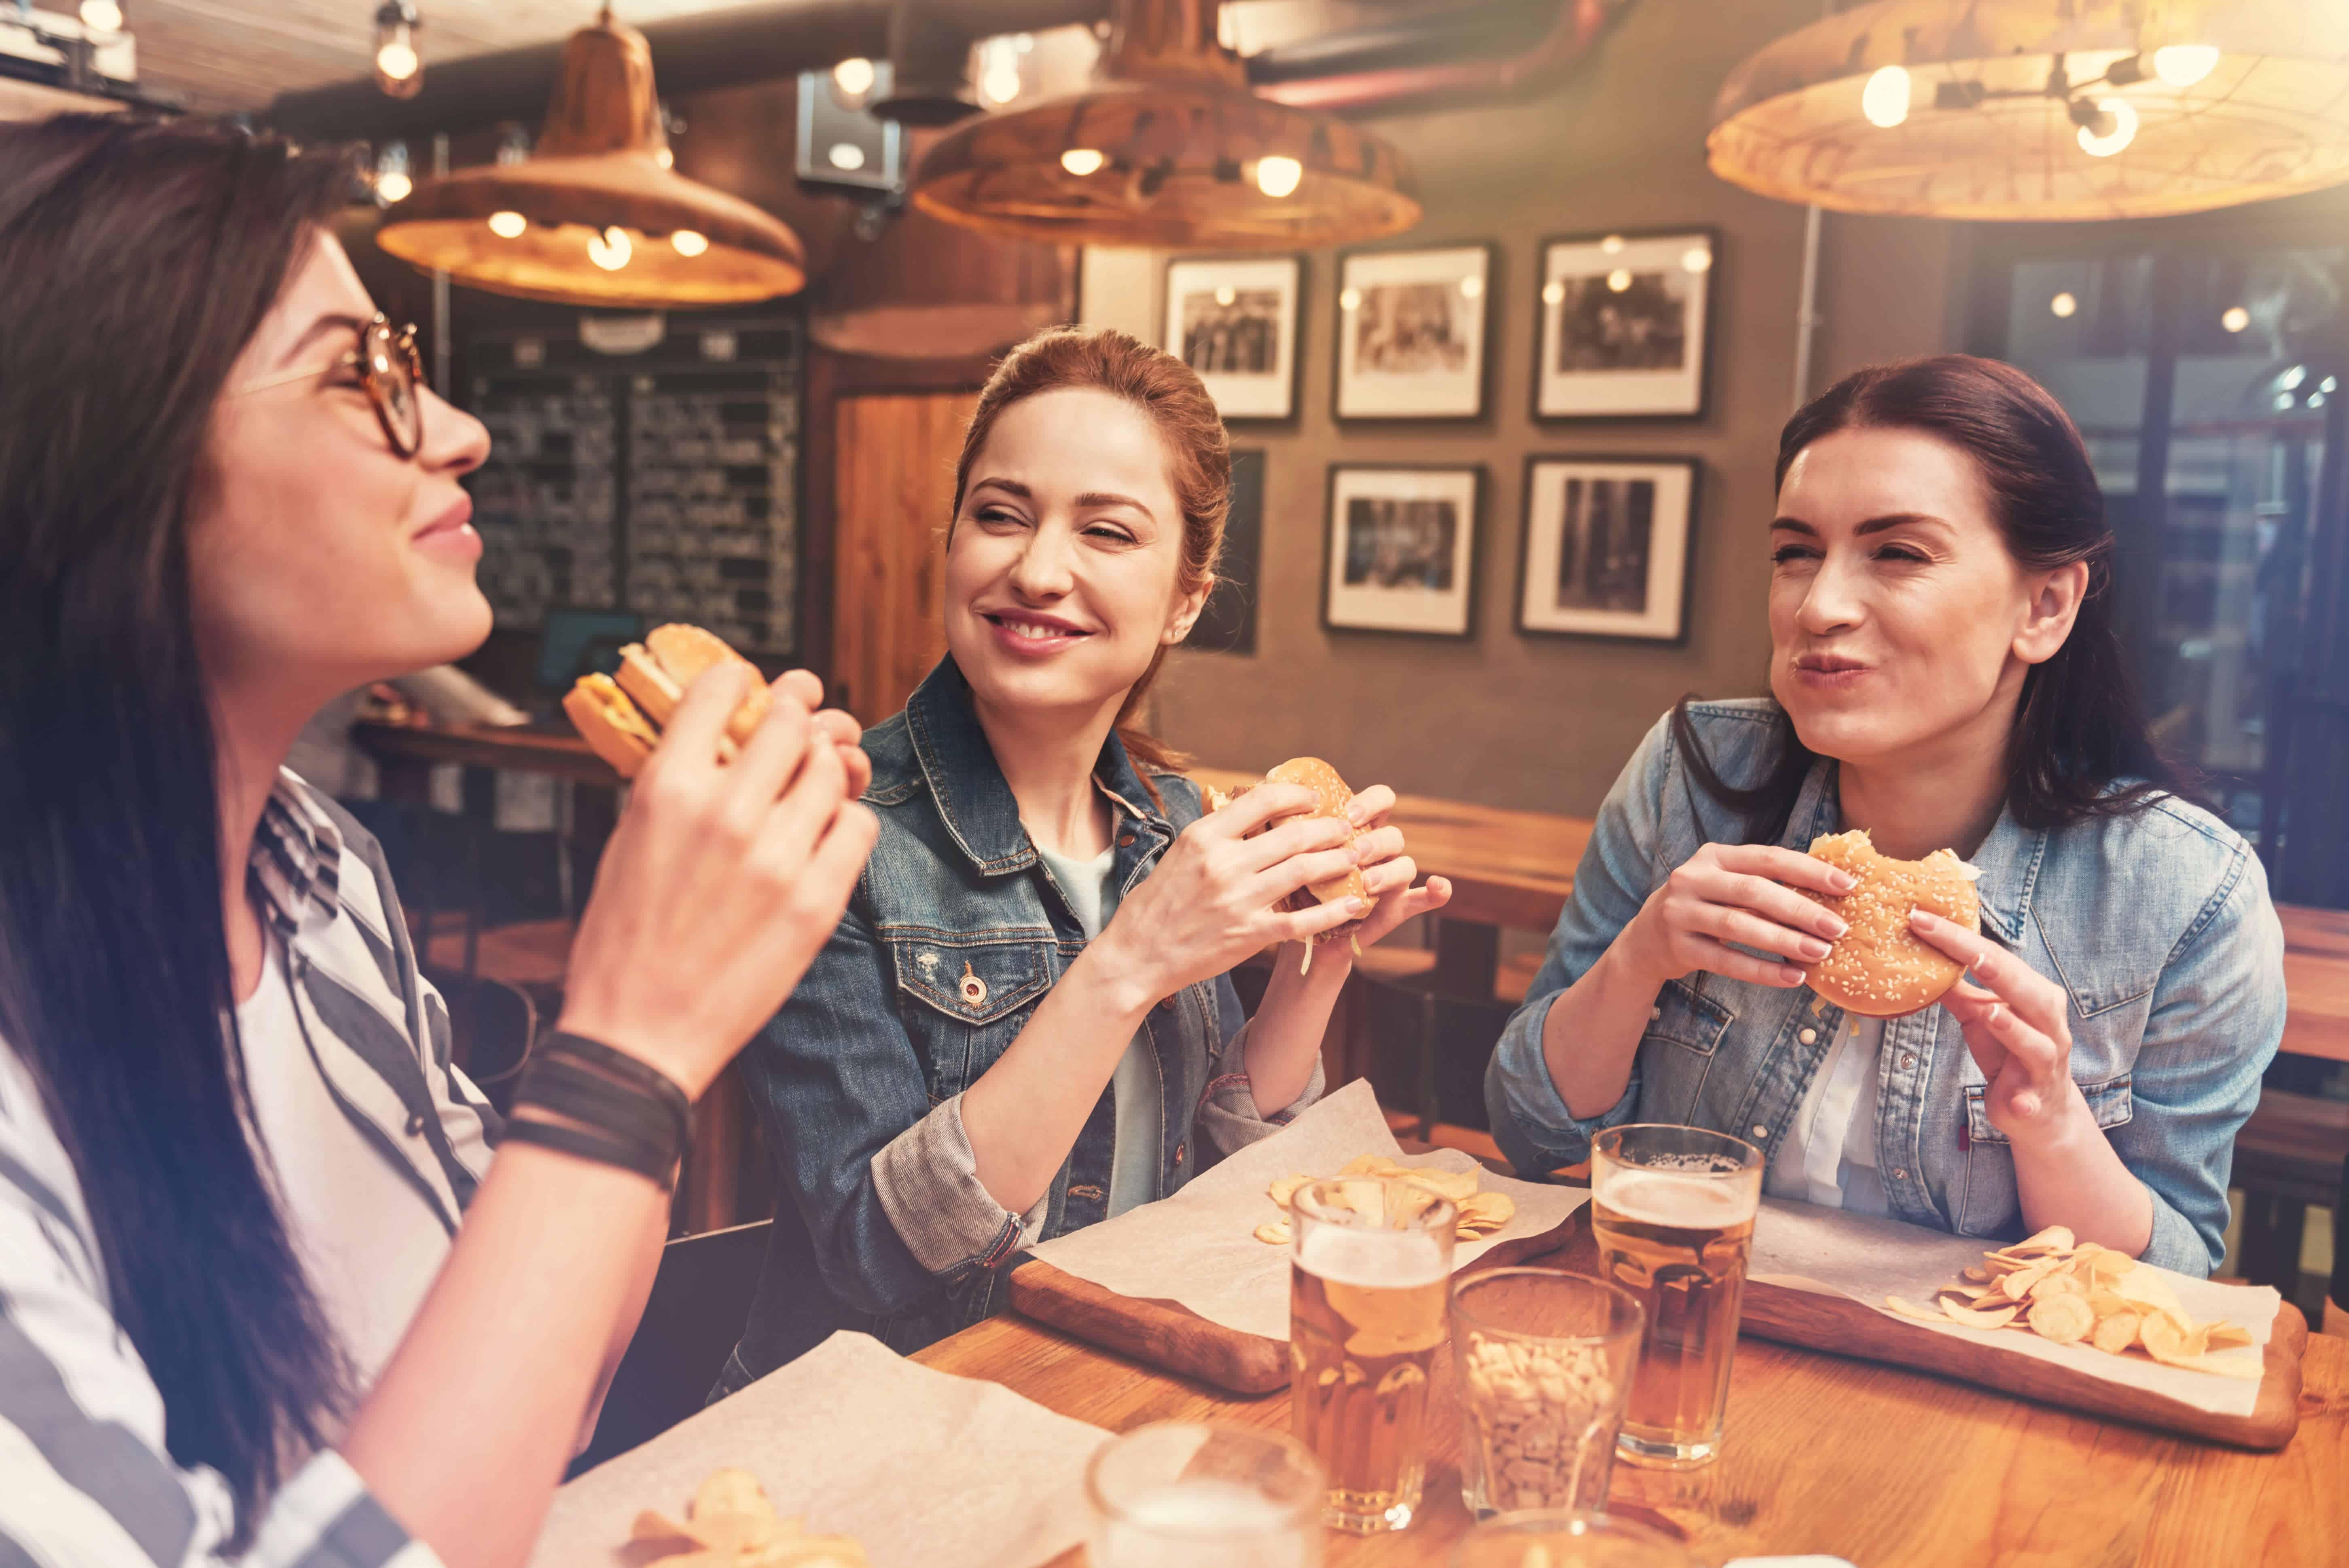 Milennials with food